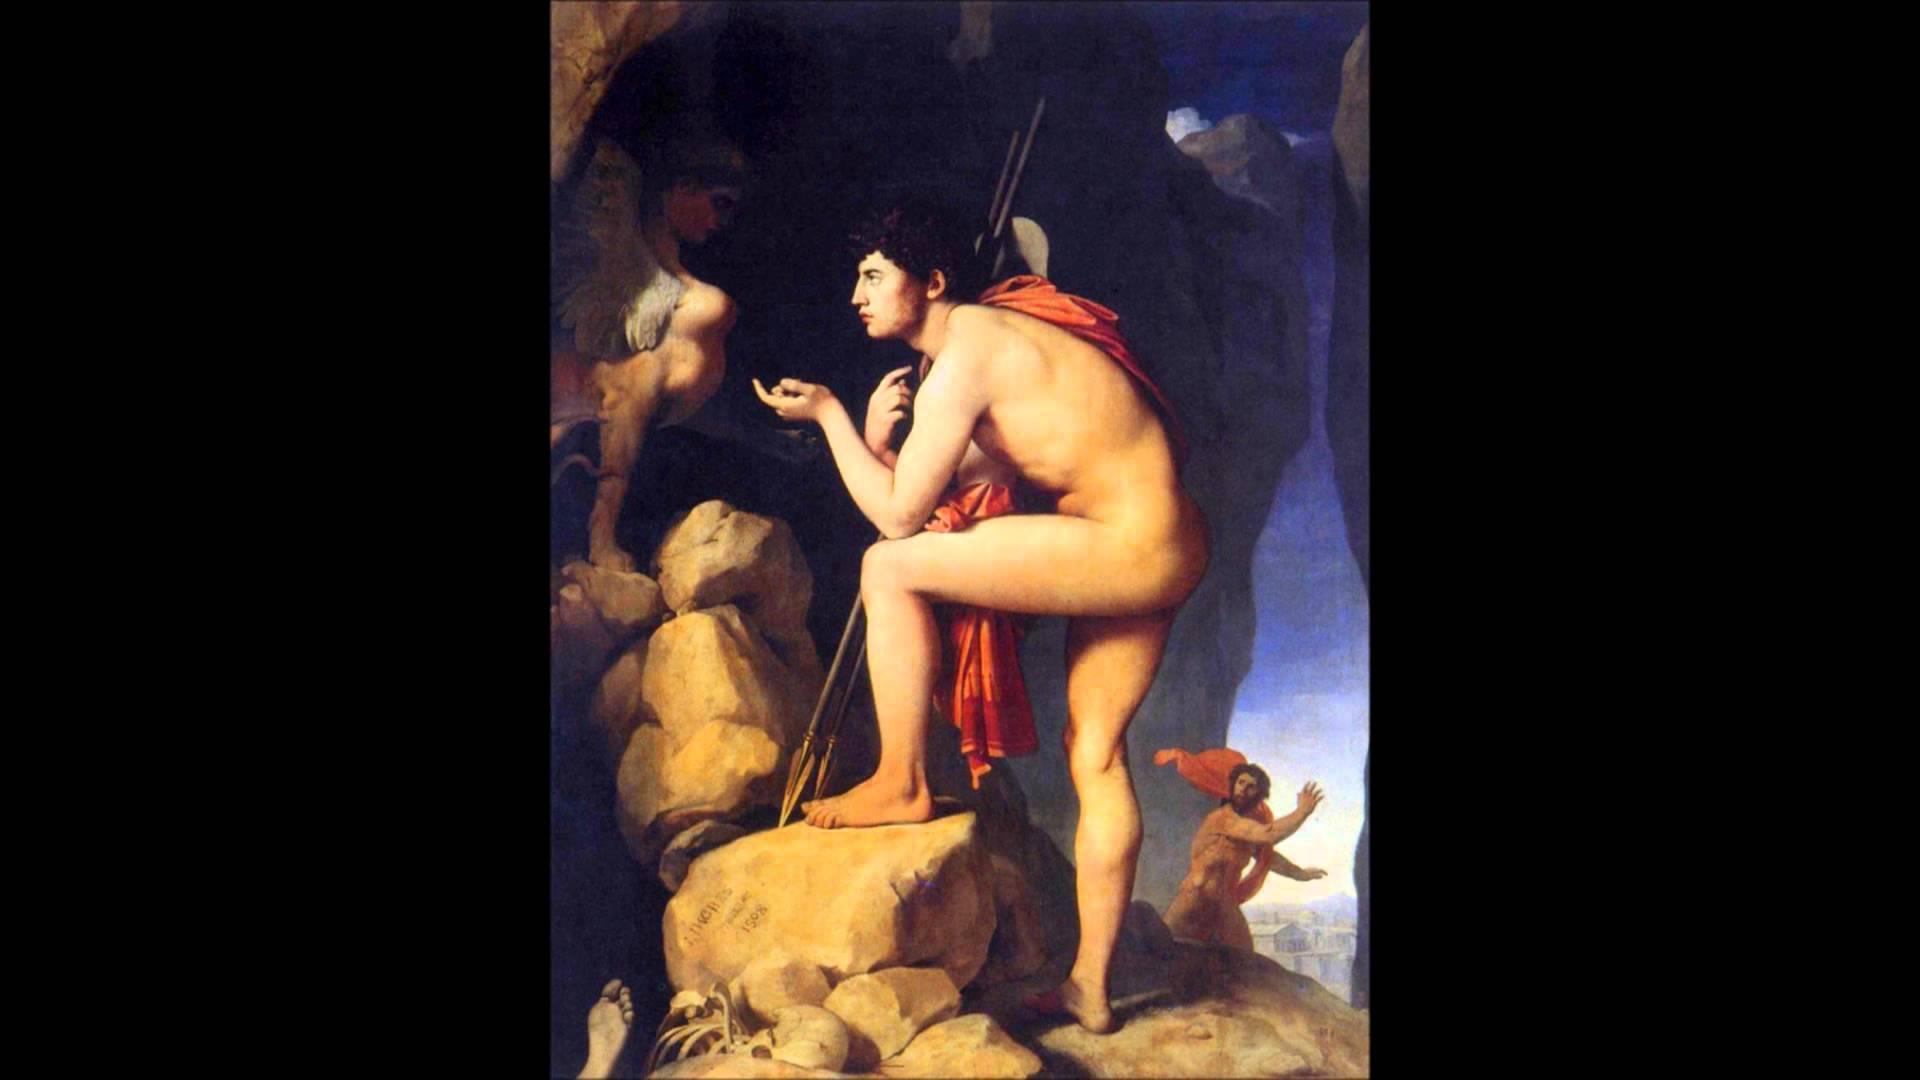 Ingres, Edipo e la Sfinge, 1808, olio su tela,189 x 144 cm, Museo del Louvre a Parigi.